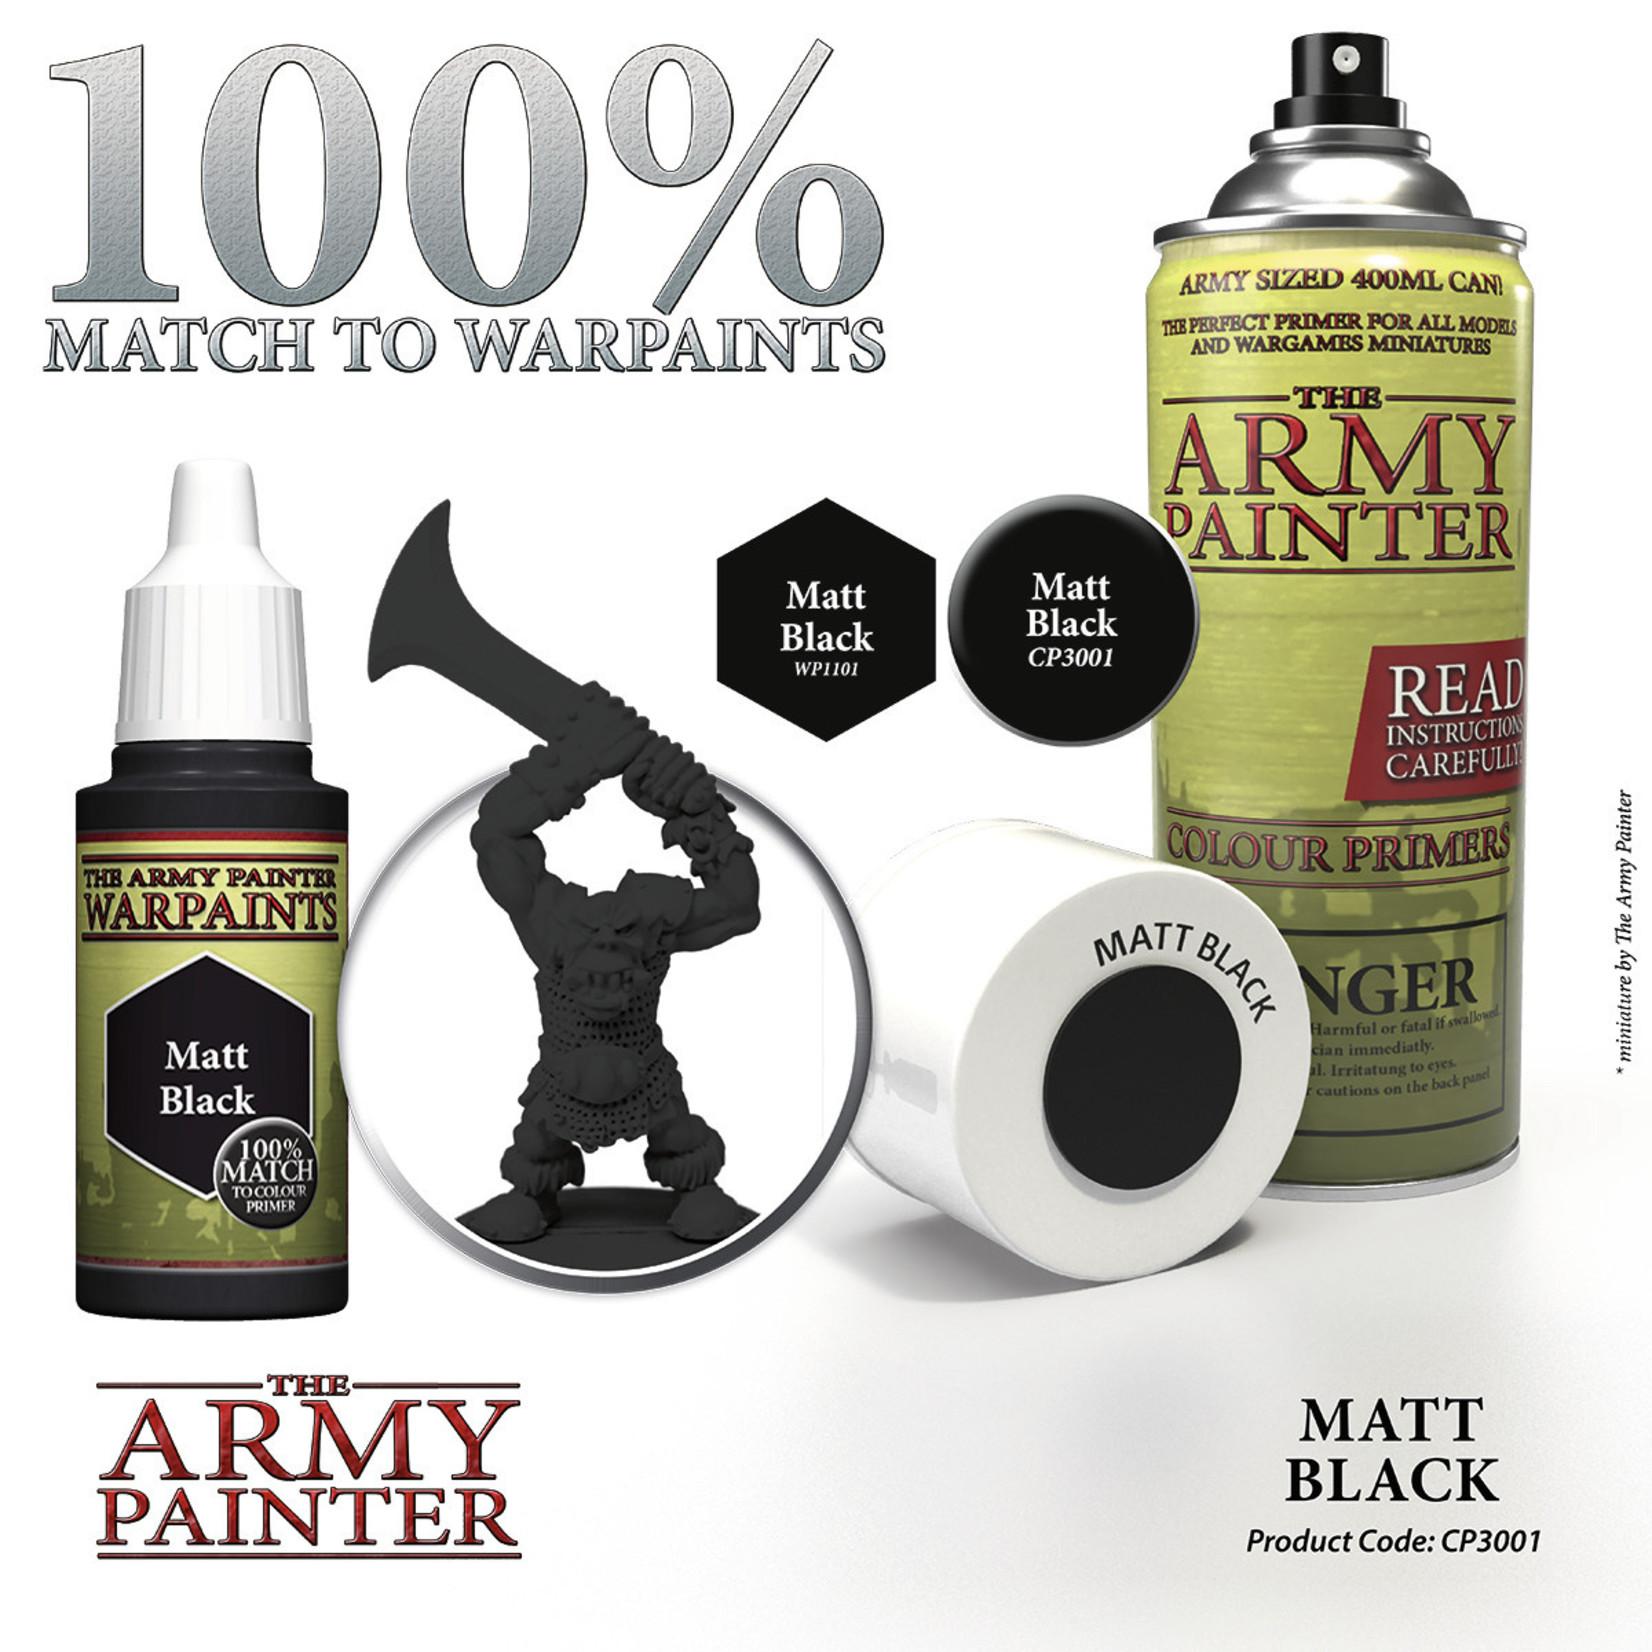 The Army Painter The Army Painter: Primer:  Matt Black